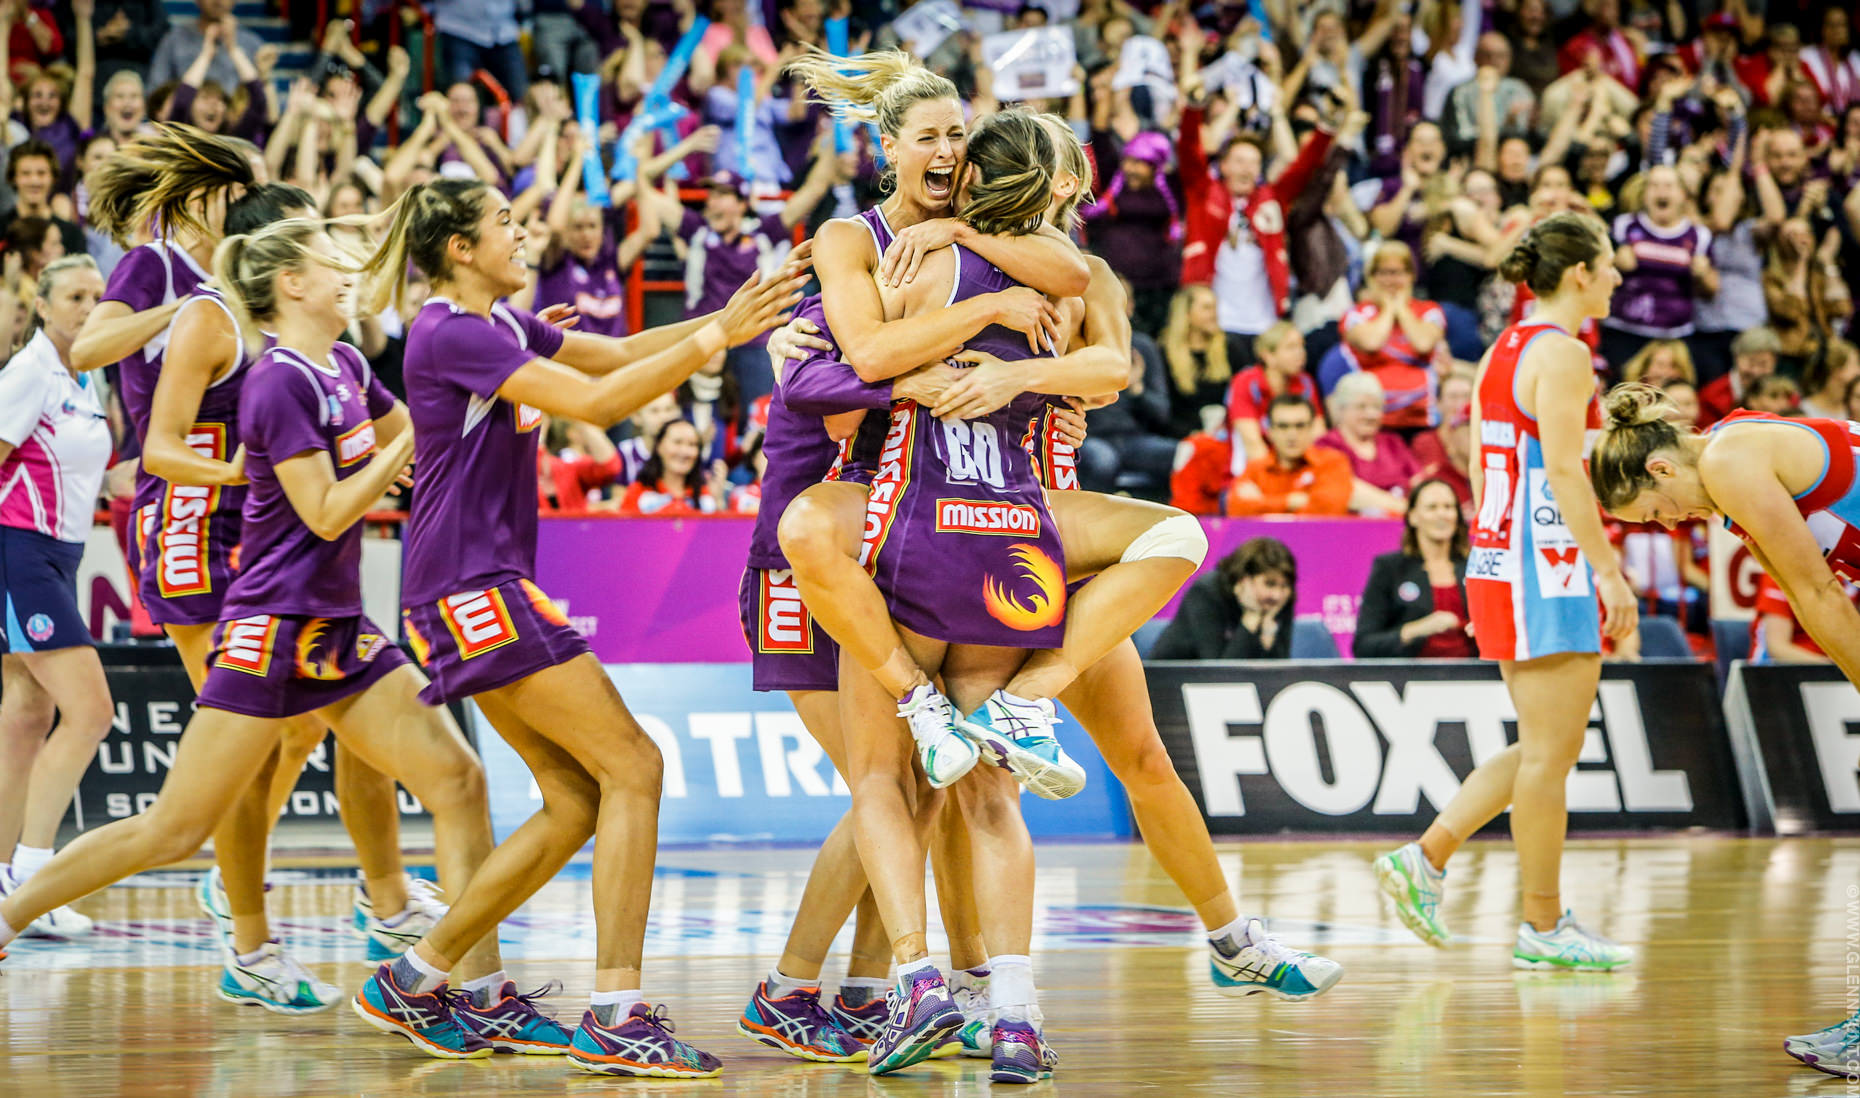 Australian Sport Photographer